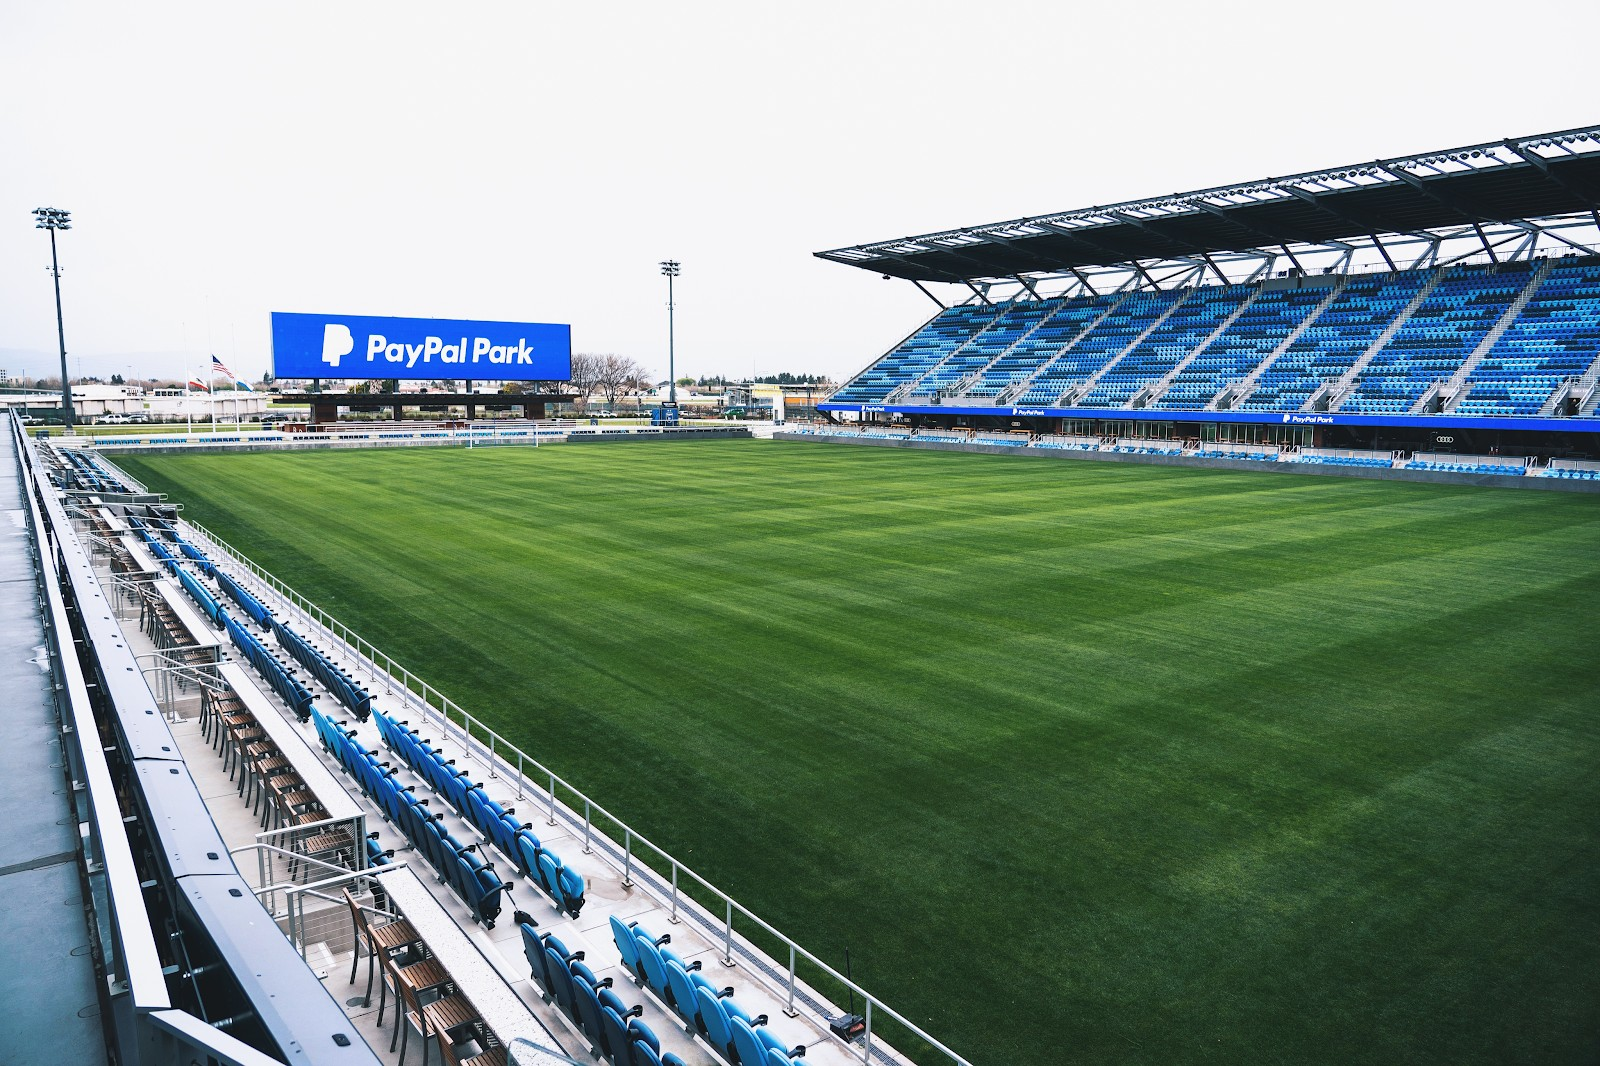 PayPal Park, San Jose Earthquakes stadium